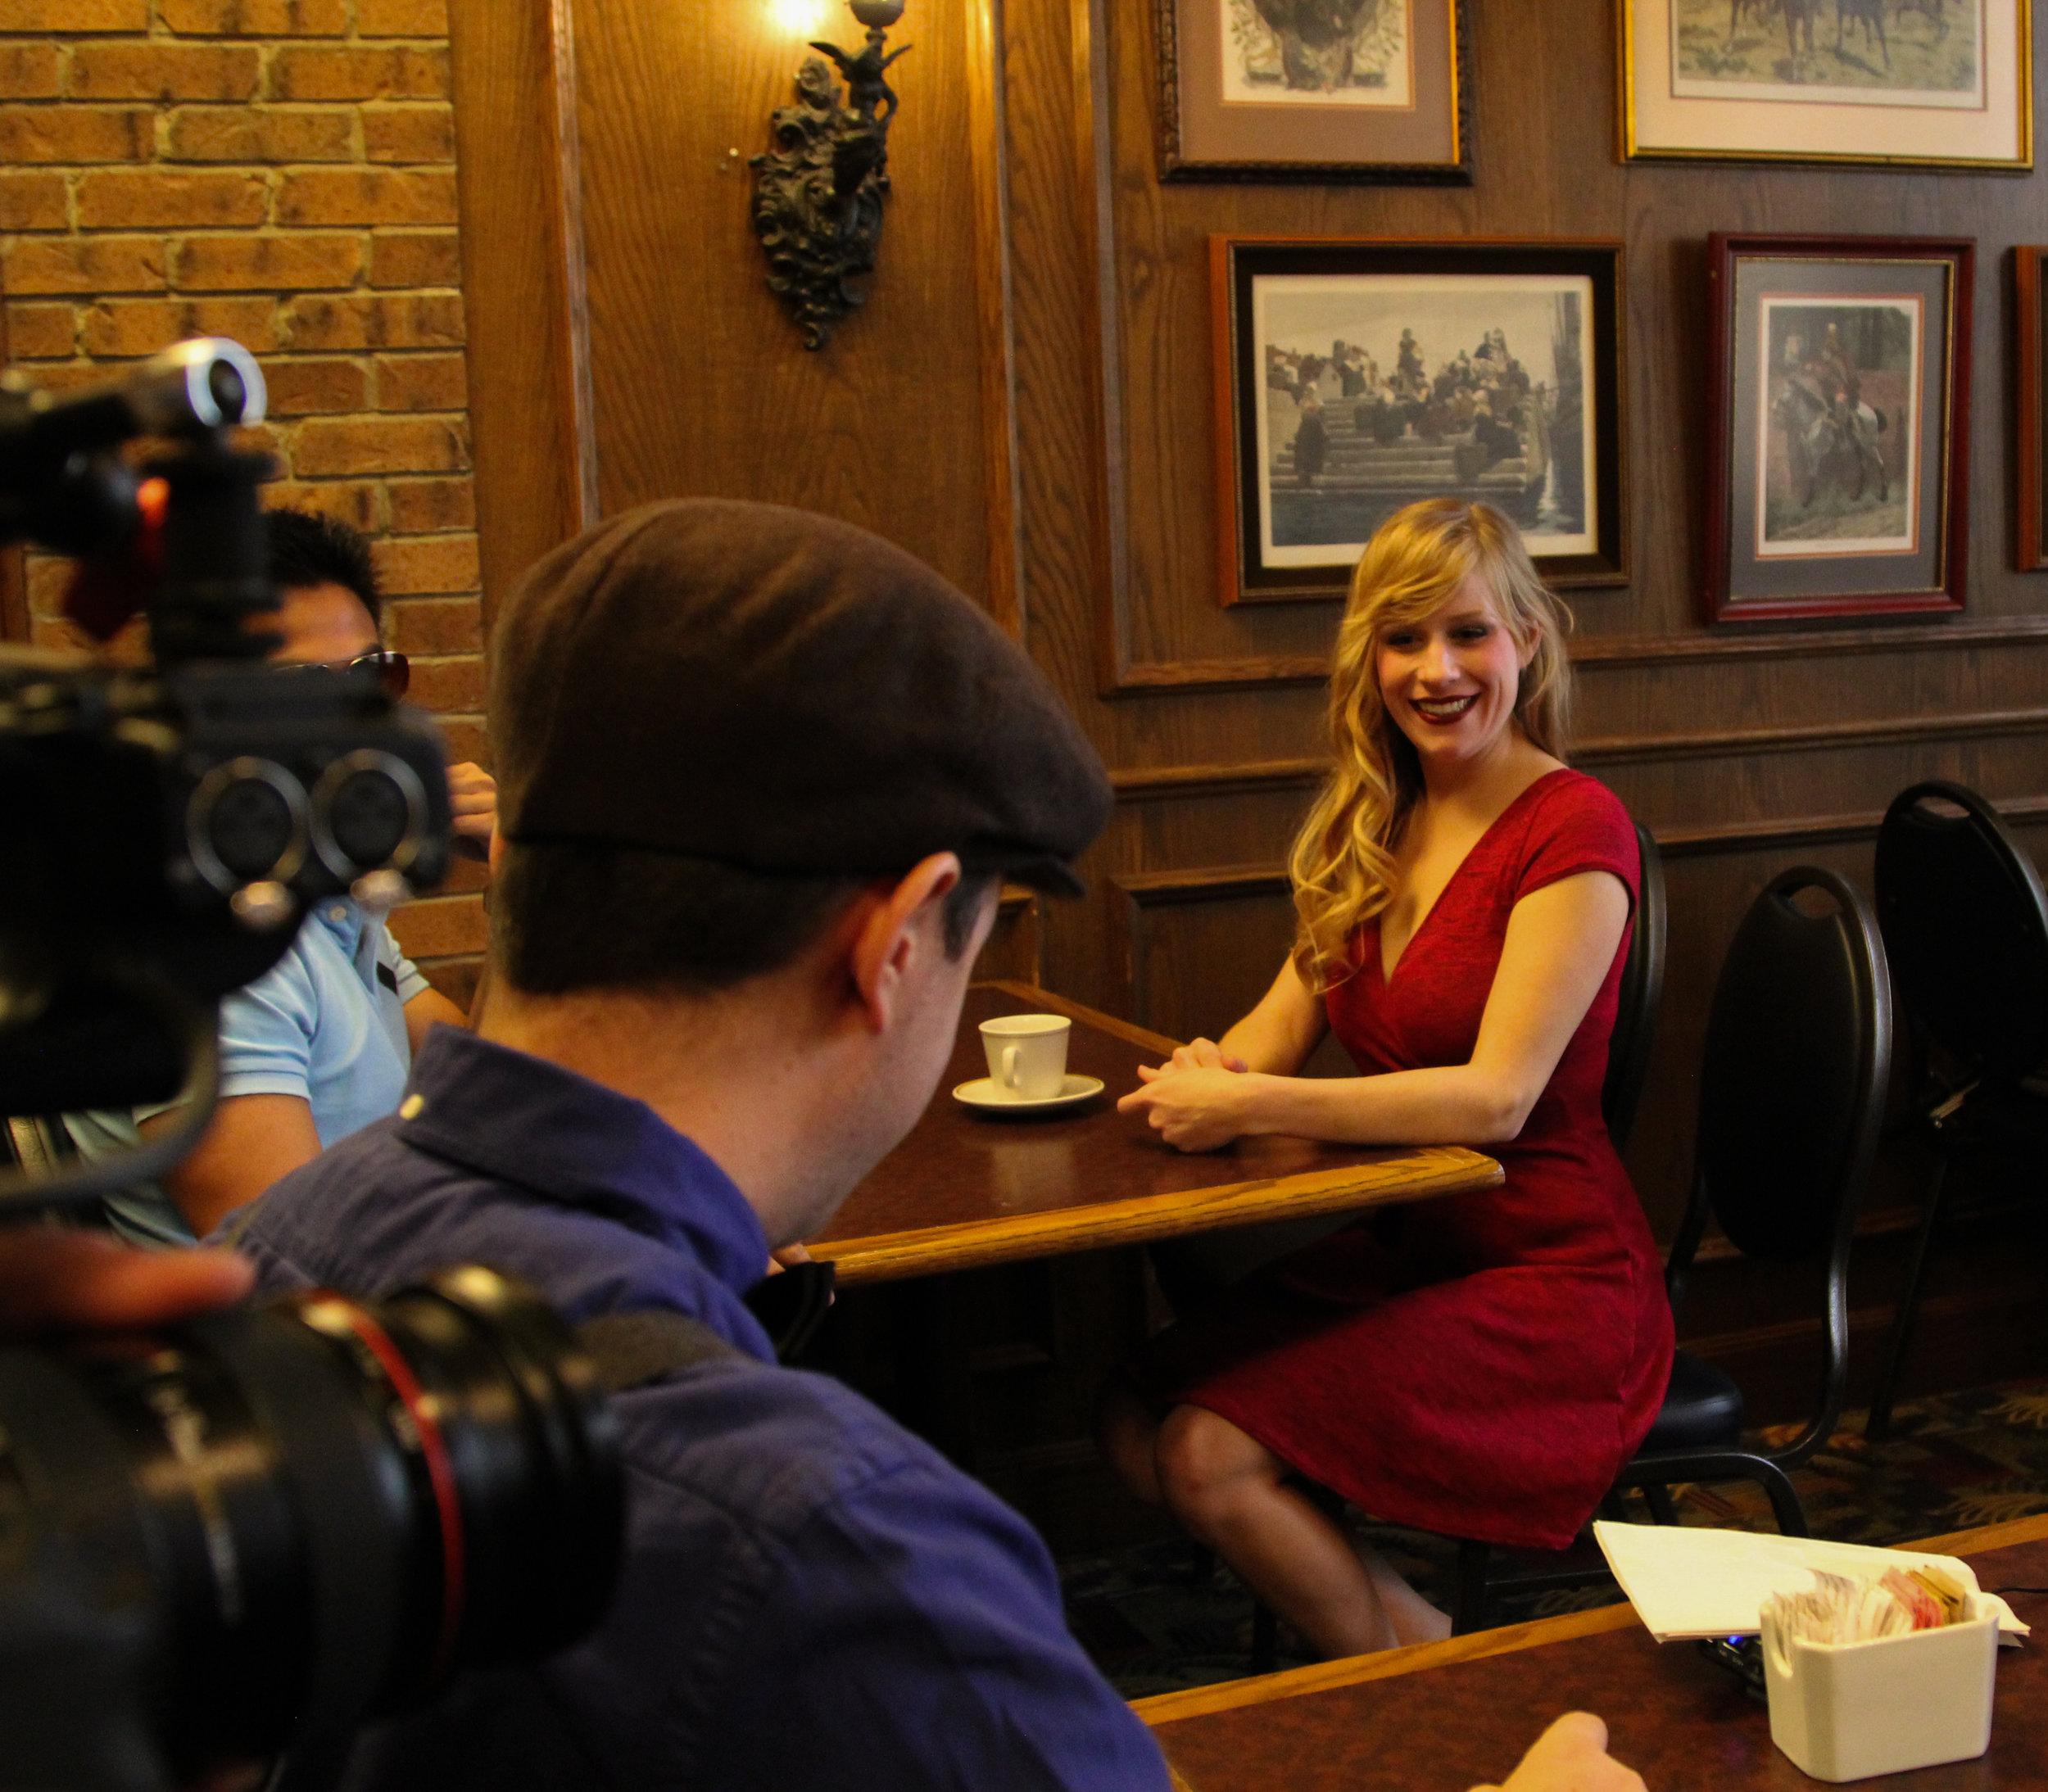 Edmonton Videography